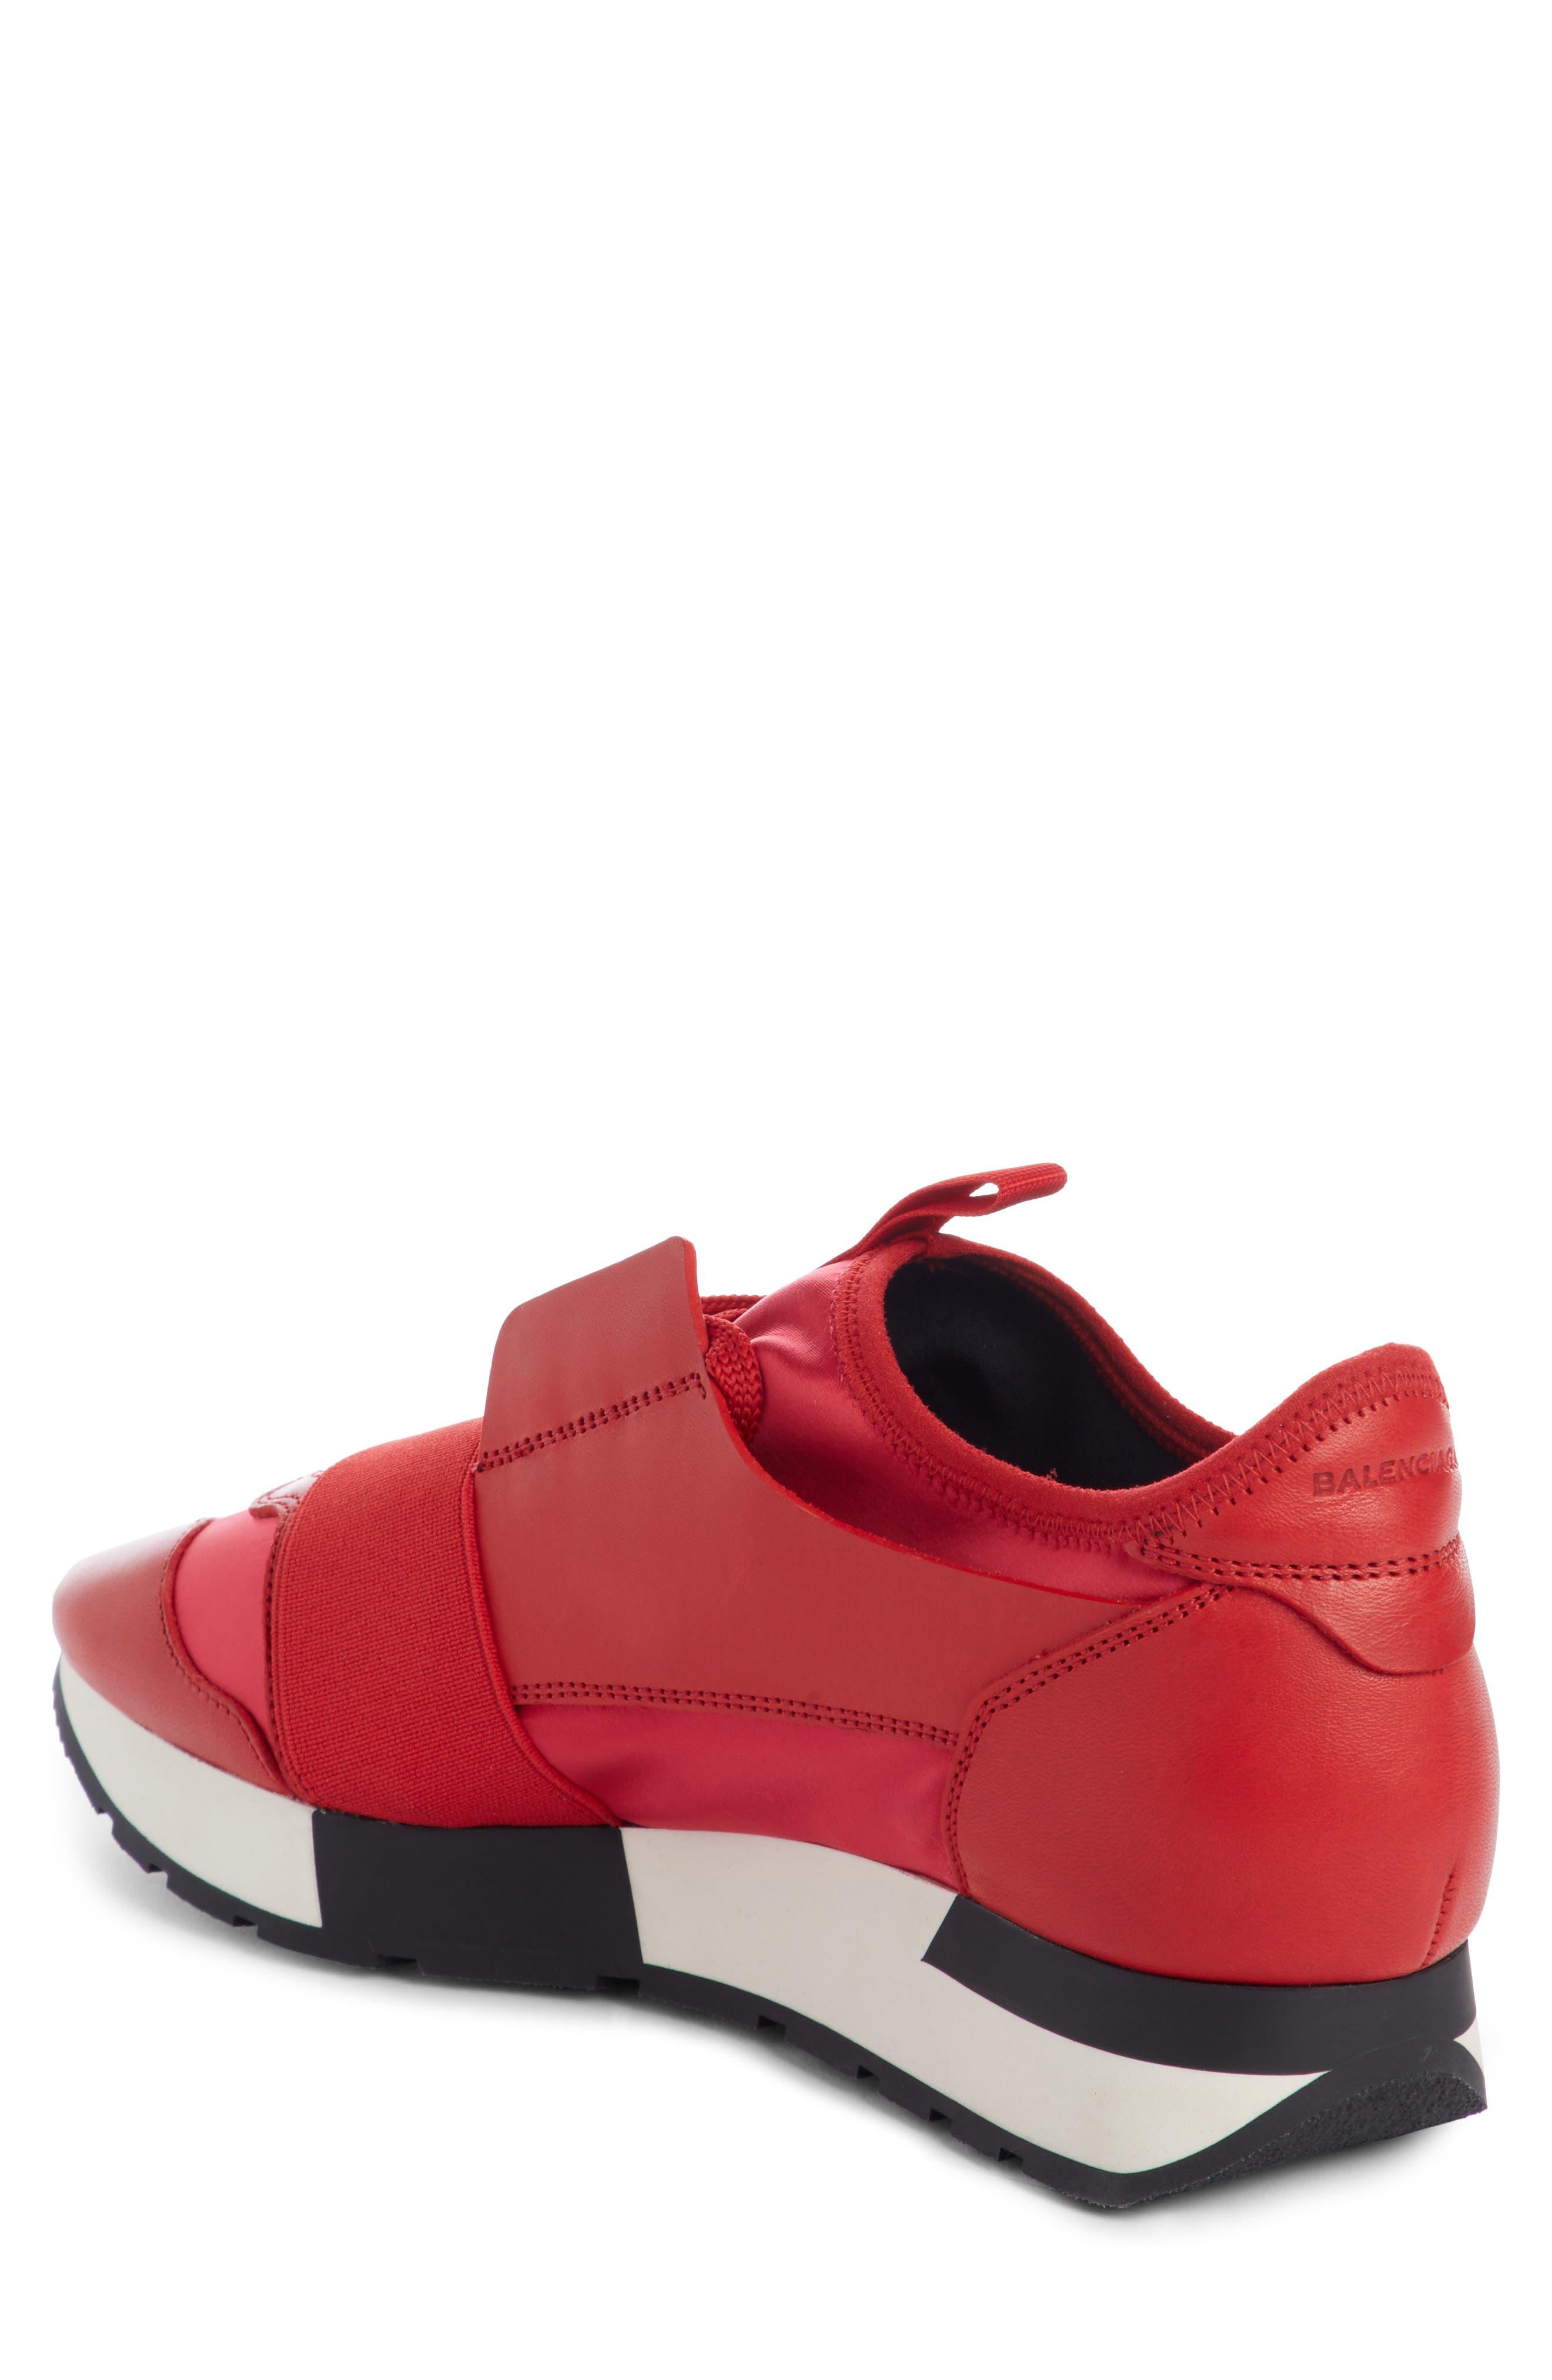 Alternate Image 2  - Balenciaga Mixed Media Trainer Sneaker (Women)